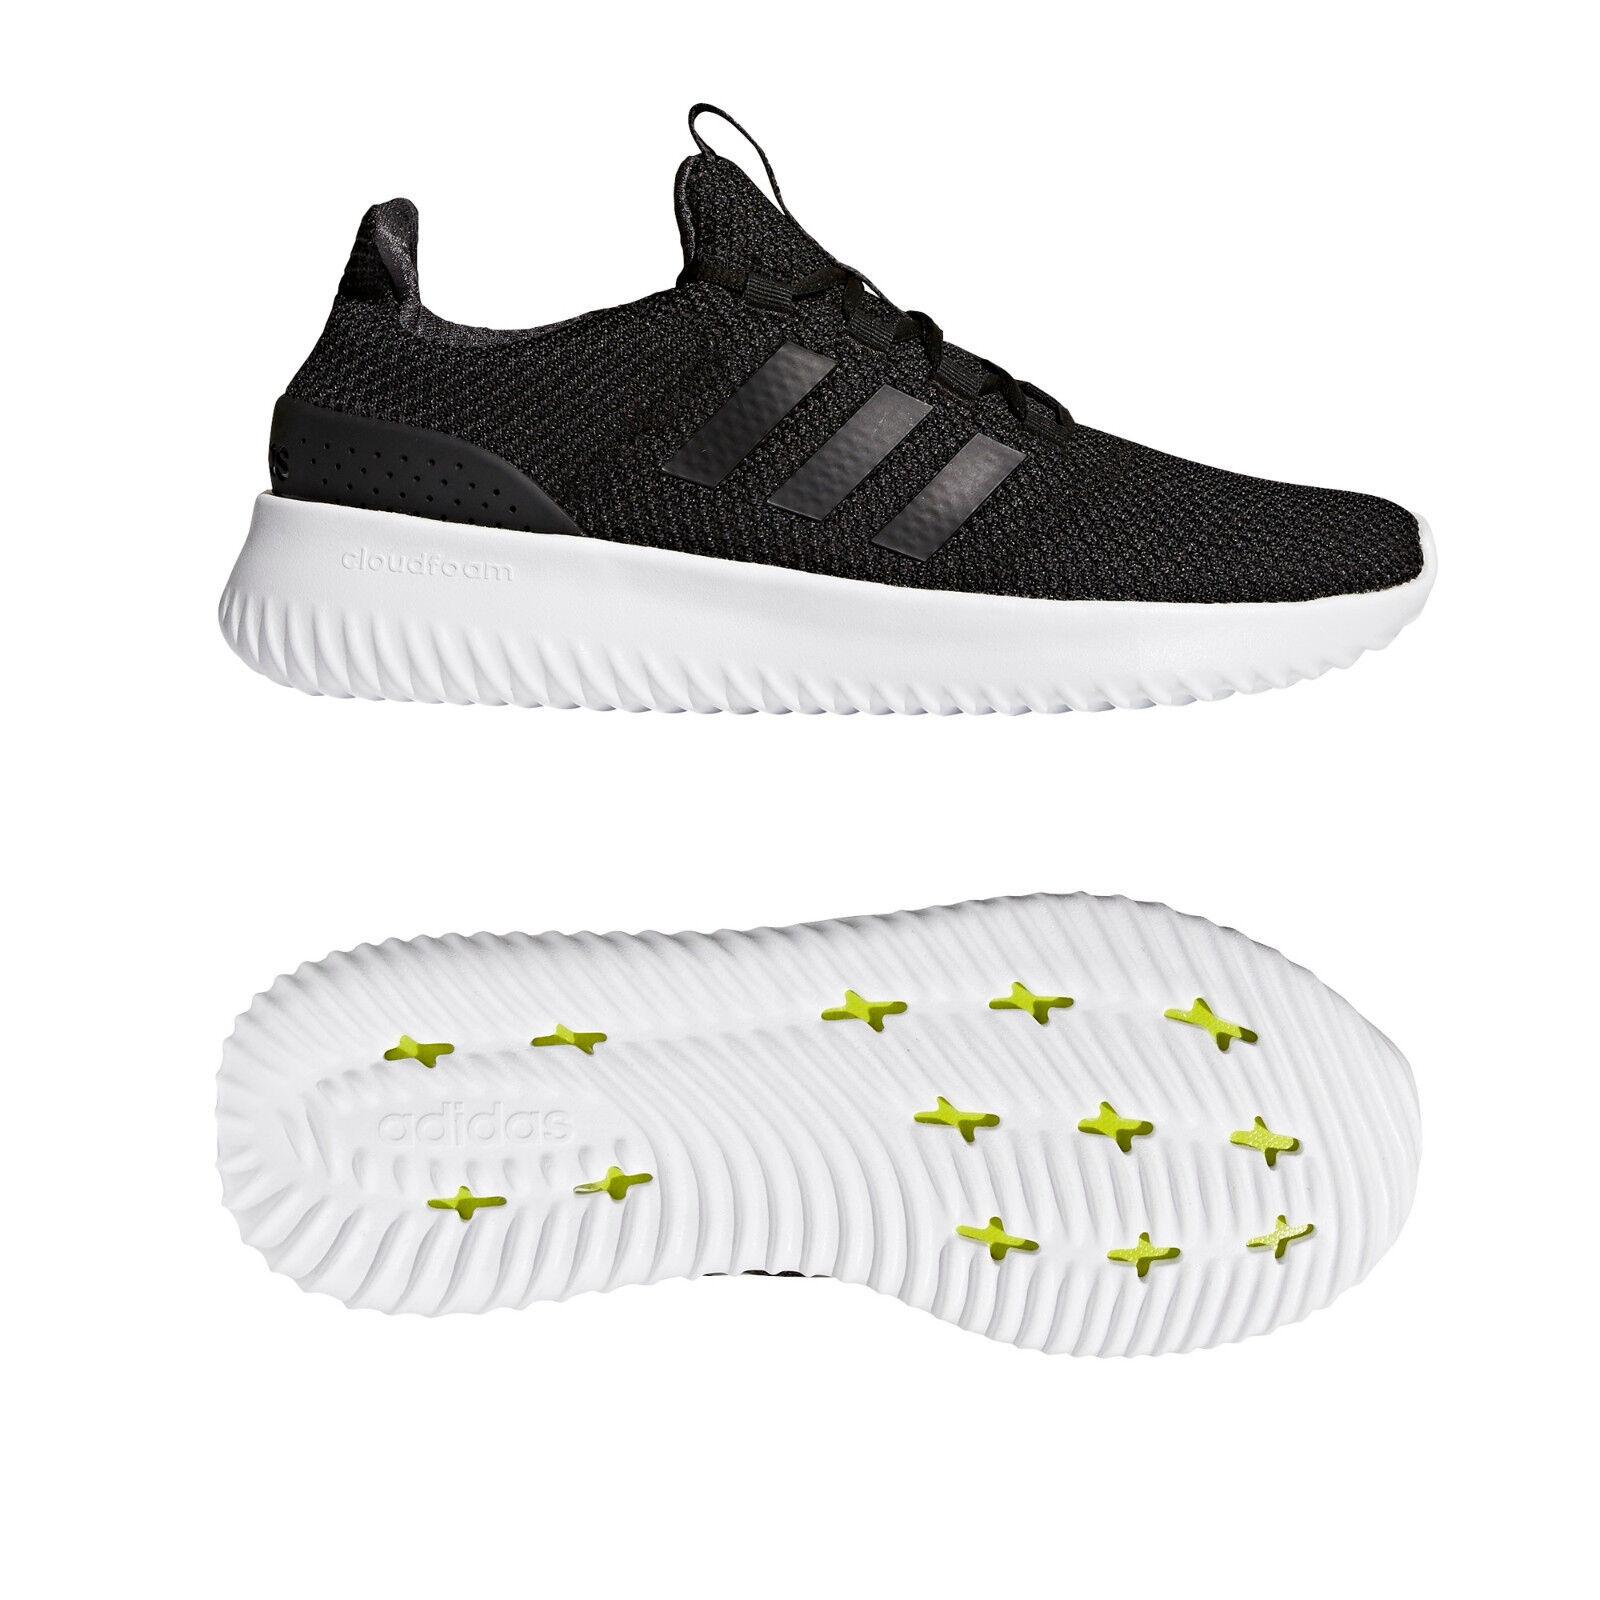 Adidas Lifestyle Neo Cloudefoam Ultimate Herren Lifestyle Adidas Freizeitschuh Sneaker 42-47 NEU 8955c2